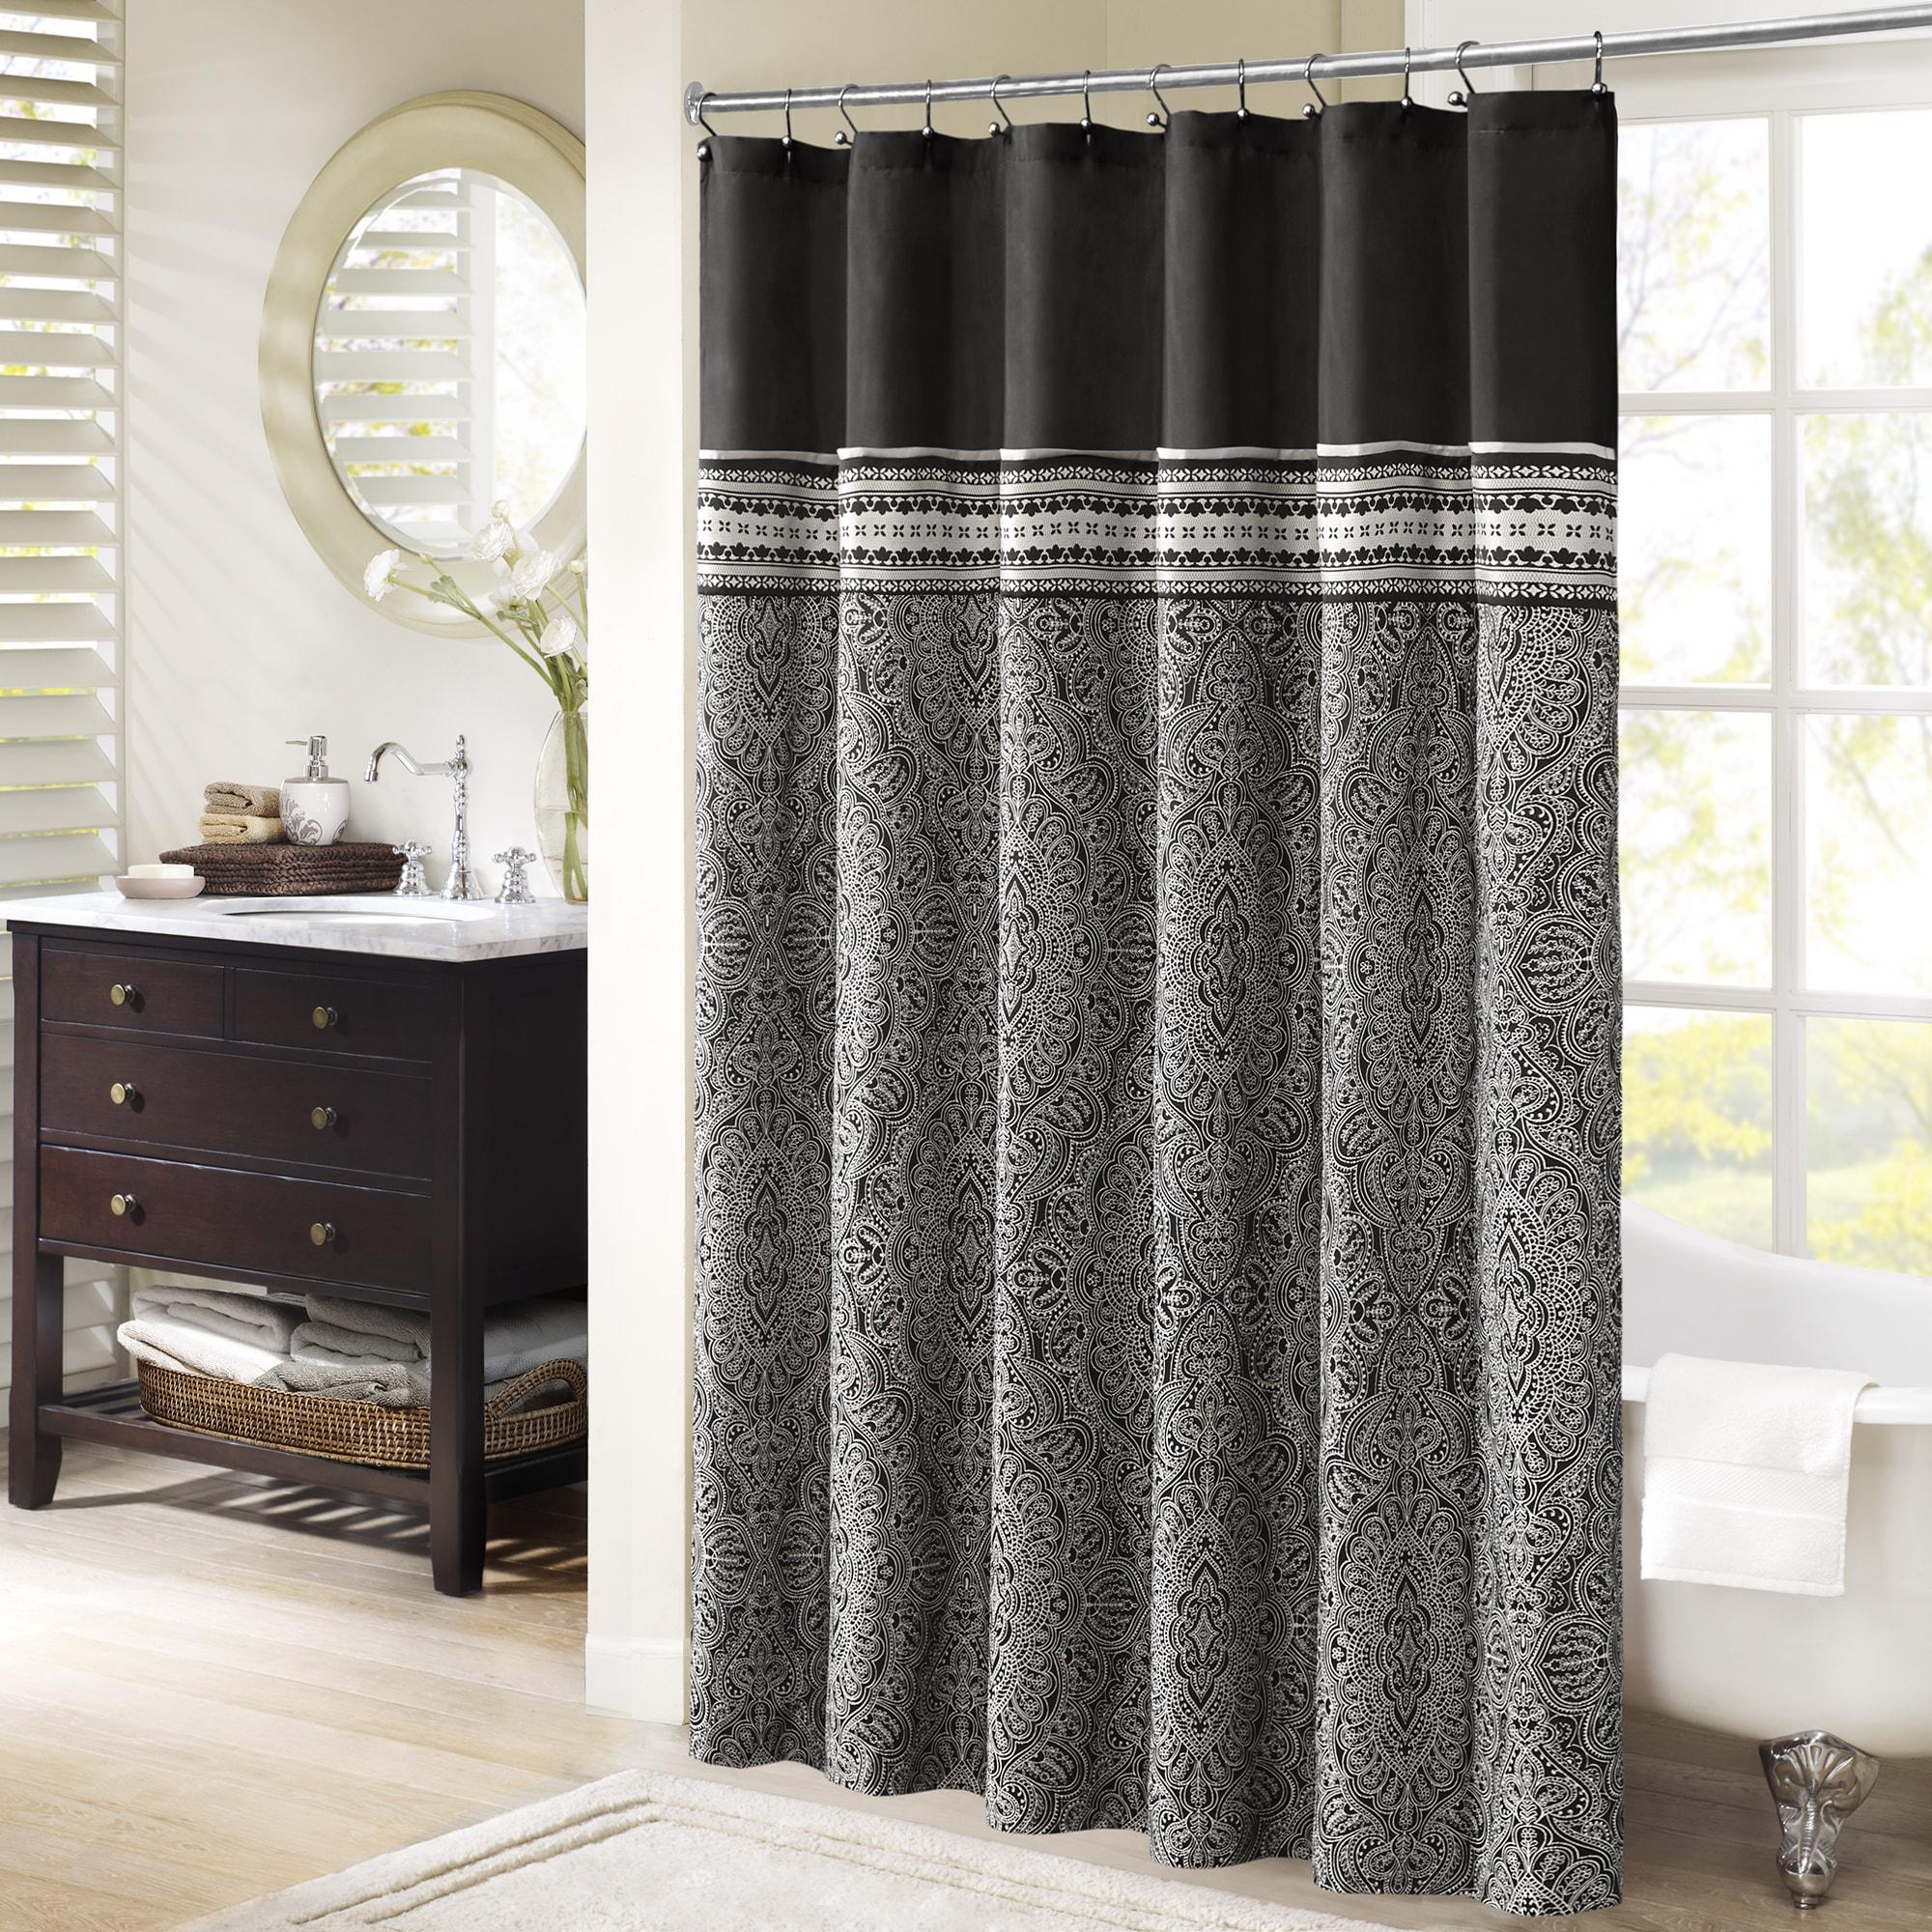 Beautiful Shop Madison Park Denton Jacquard Shower Curtain   Free Shipping Today    Overstock.com   11153067